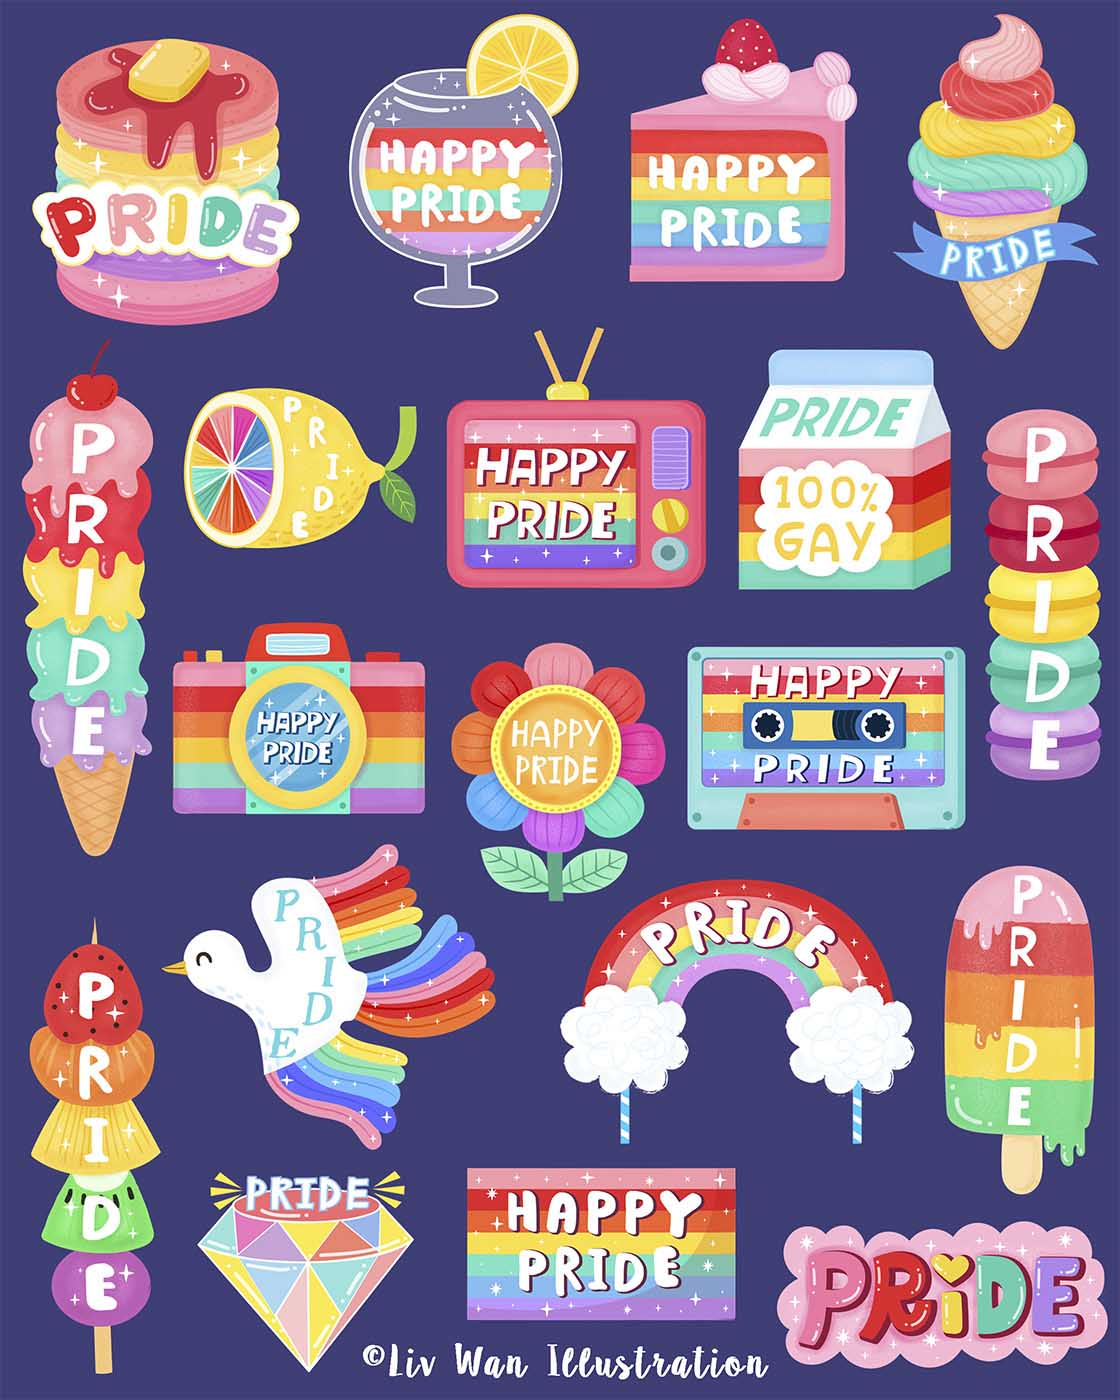 snapchat pride sticker illustrations